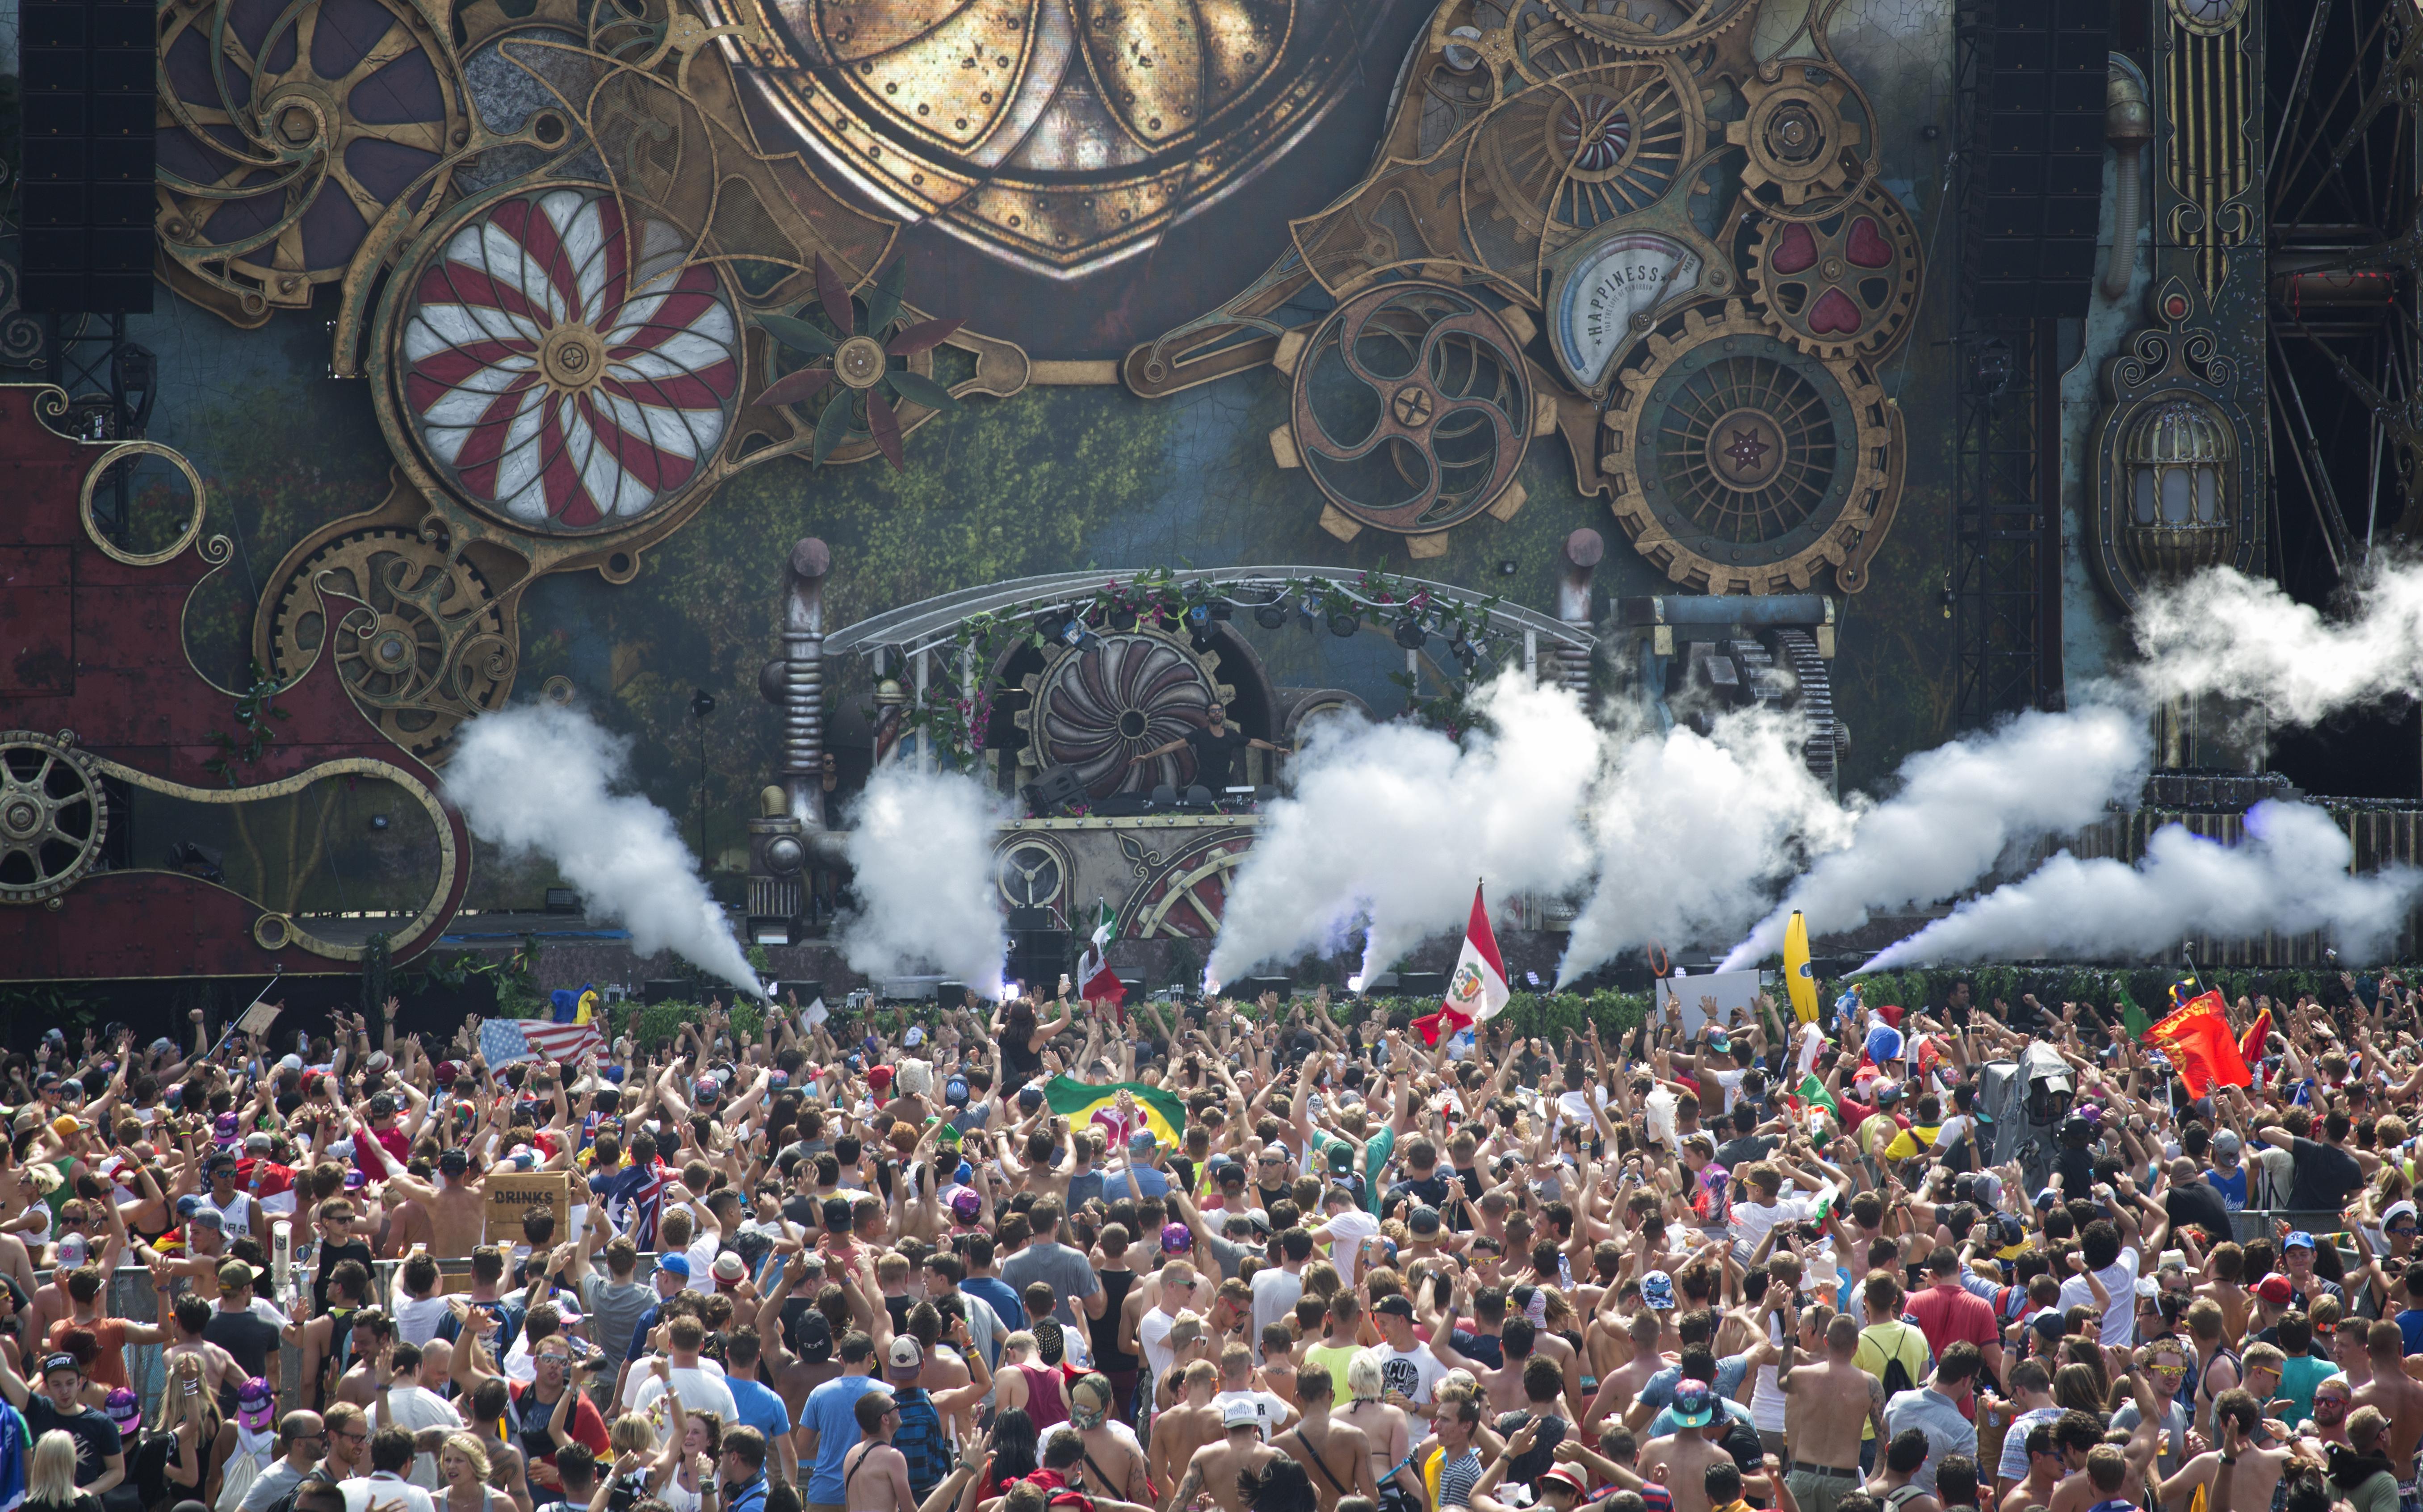 Bélgica - Tomorrowland